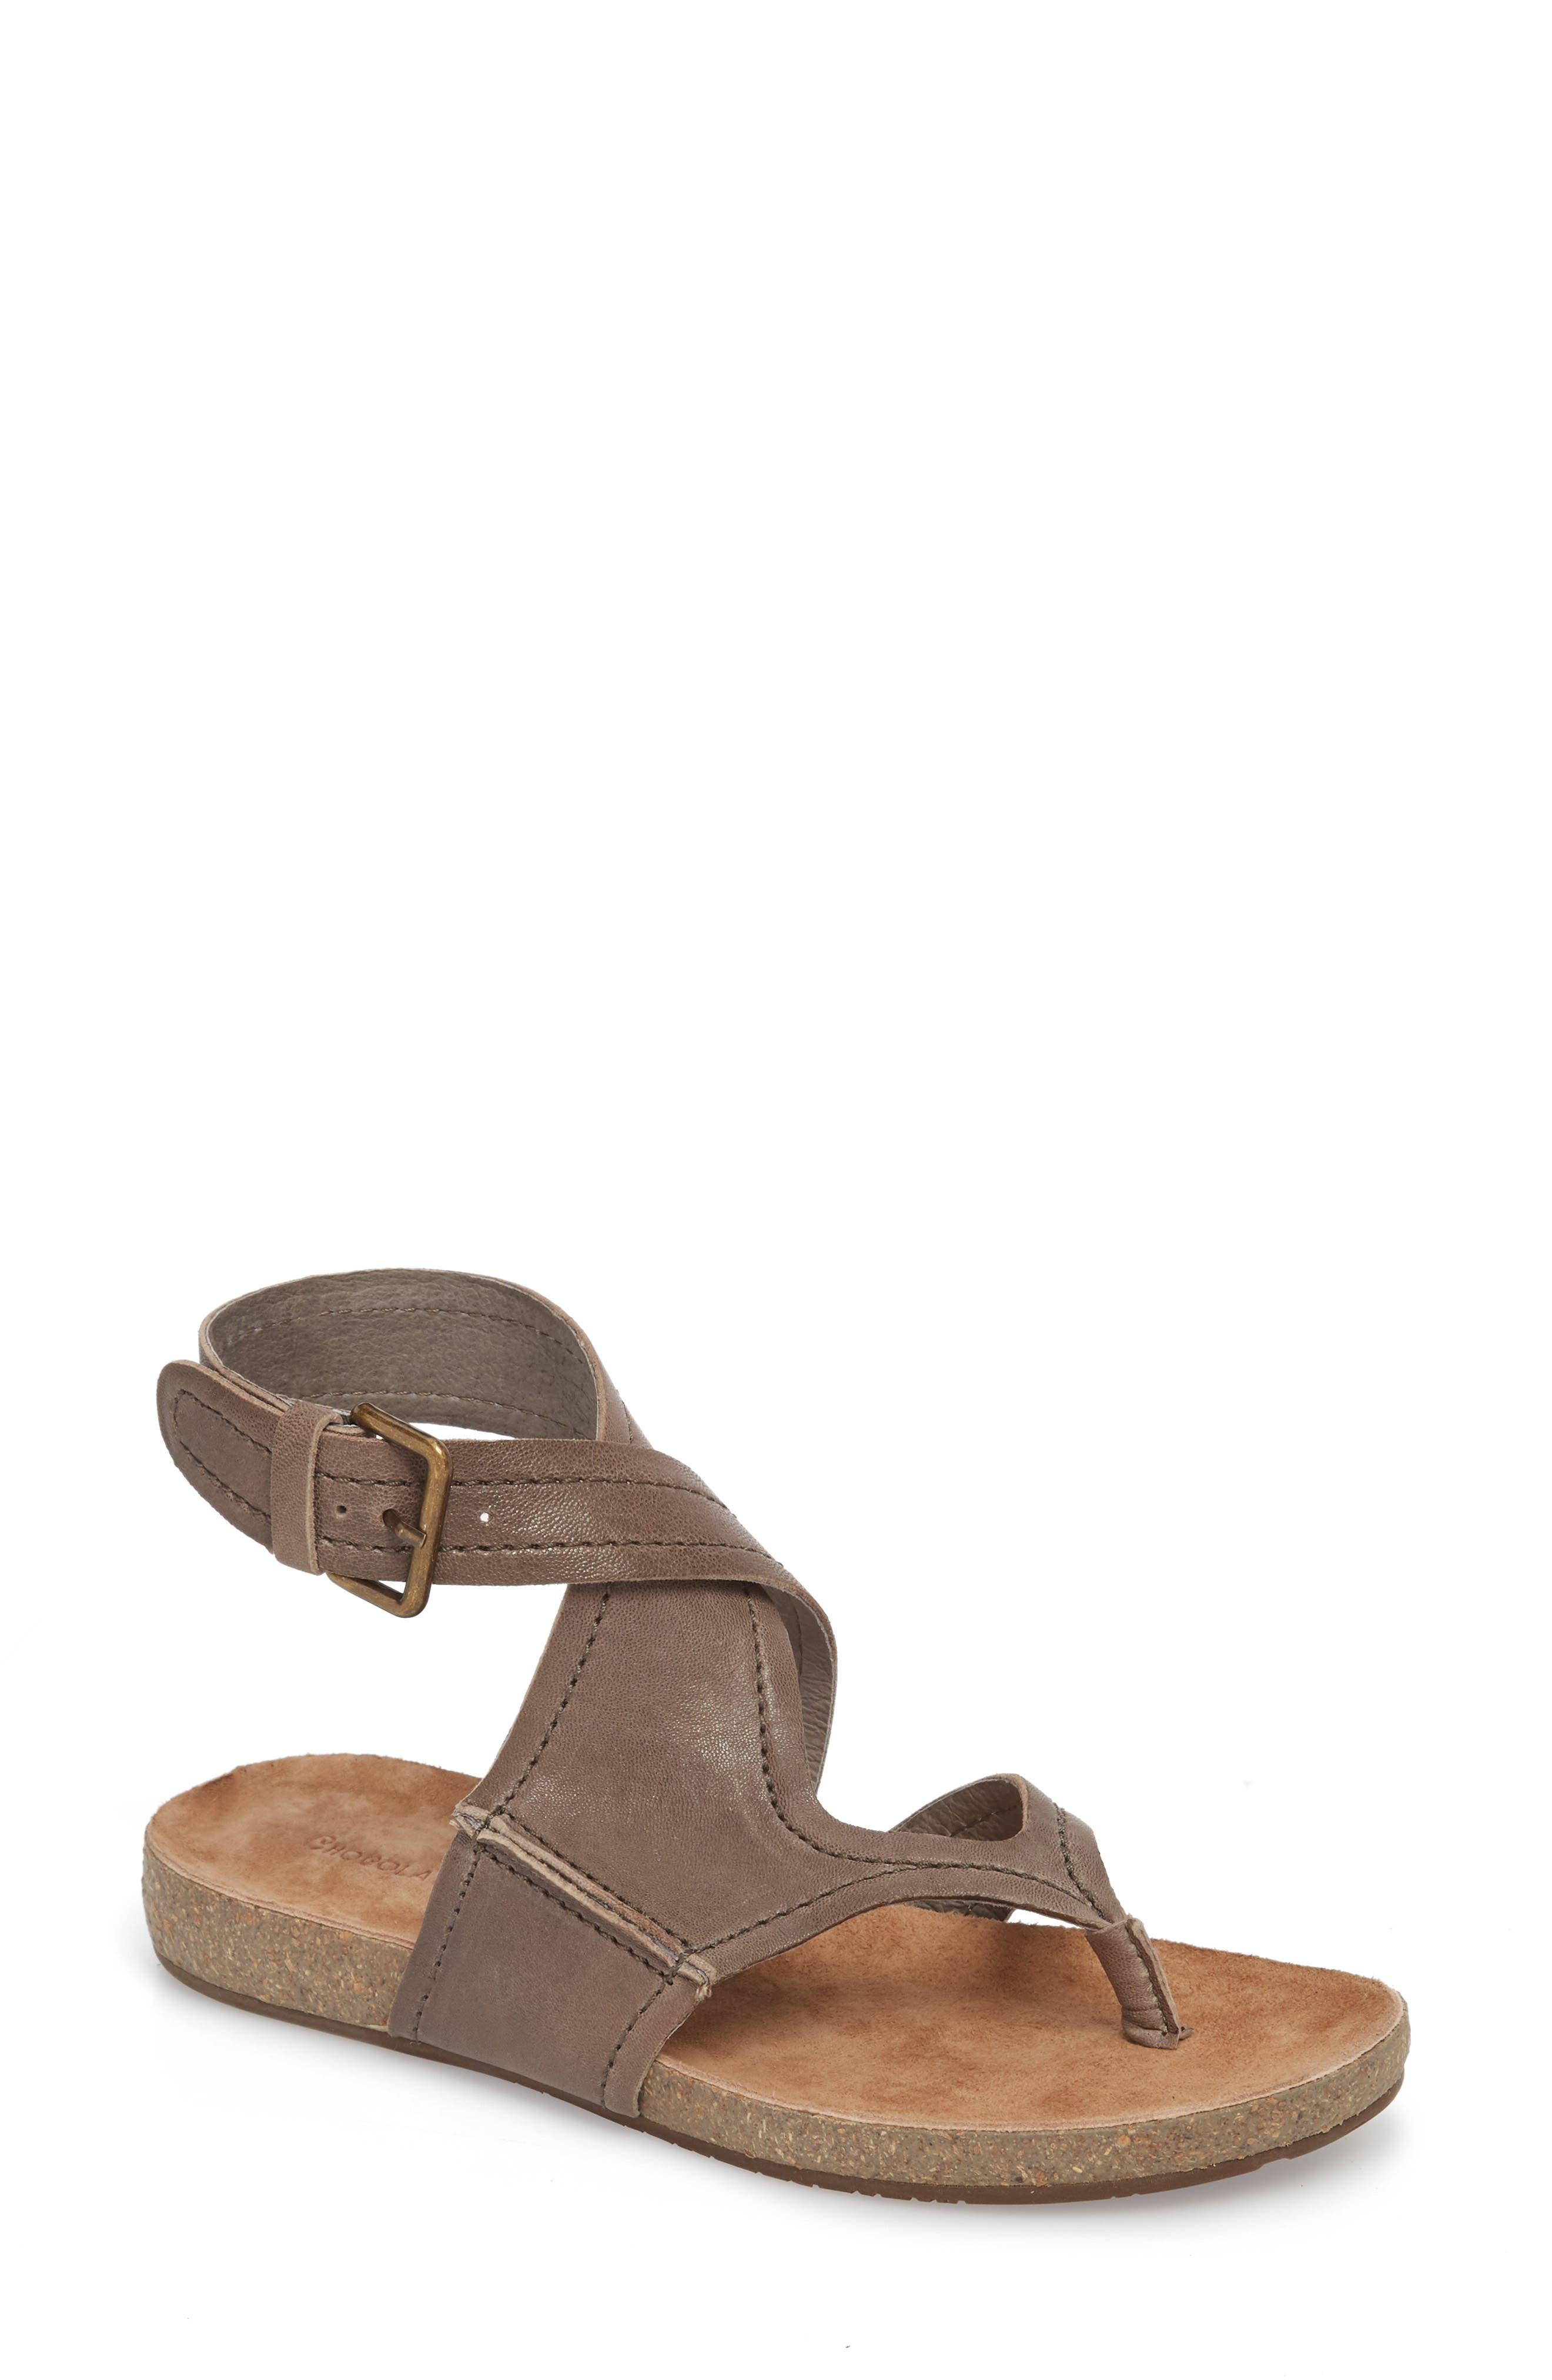 Yagger Sandal,                         Main,                         color, 038